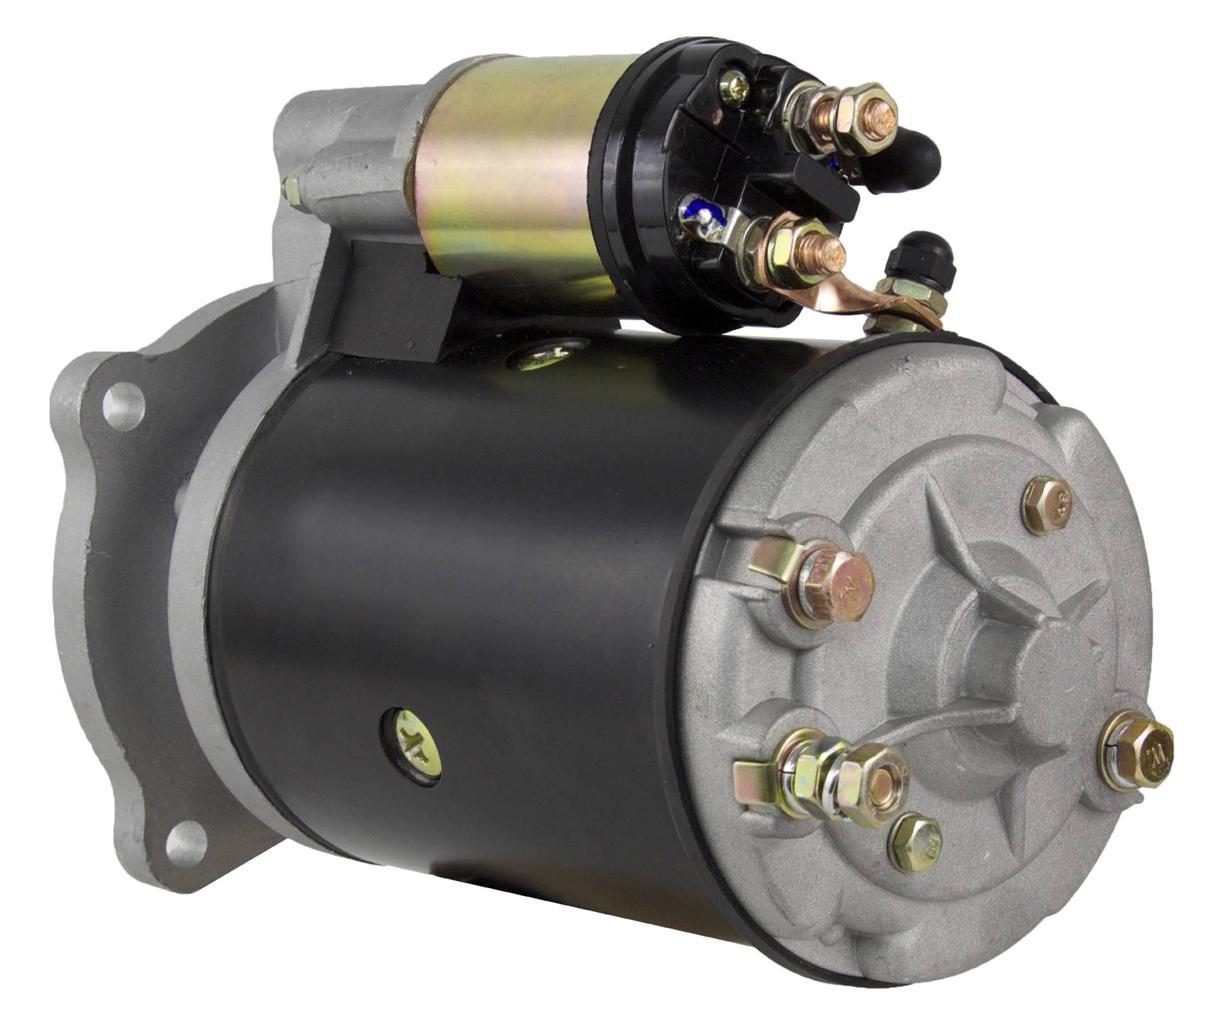 Deal Dash Com Tvs >> NEW STARTER MOTOR FITS NEW HOLLAND WINDROWER 1112 1114 907 ...